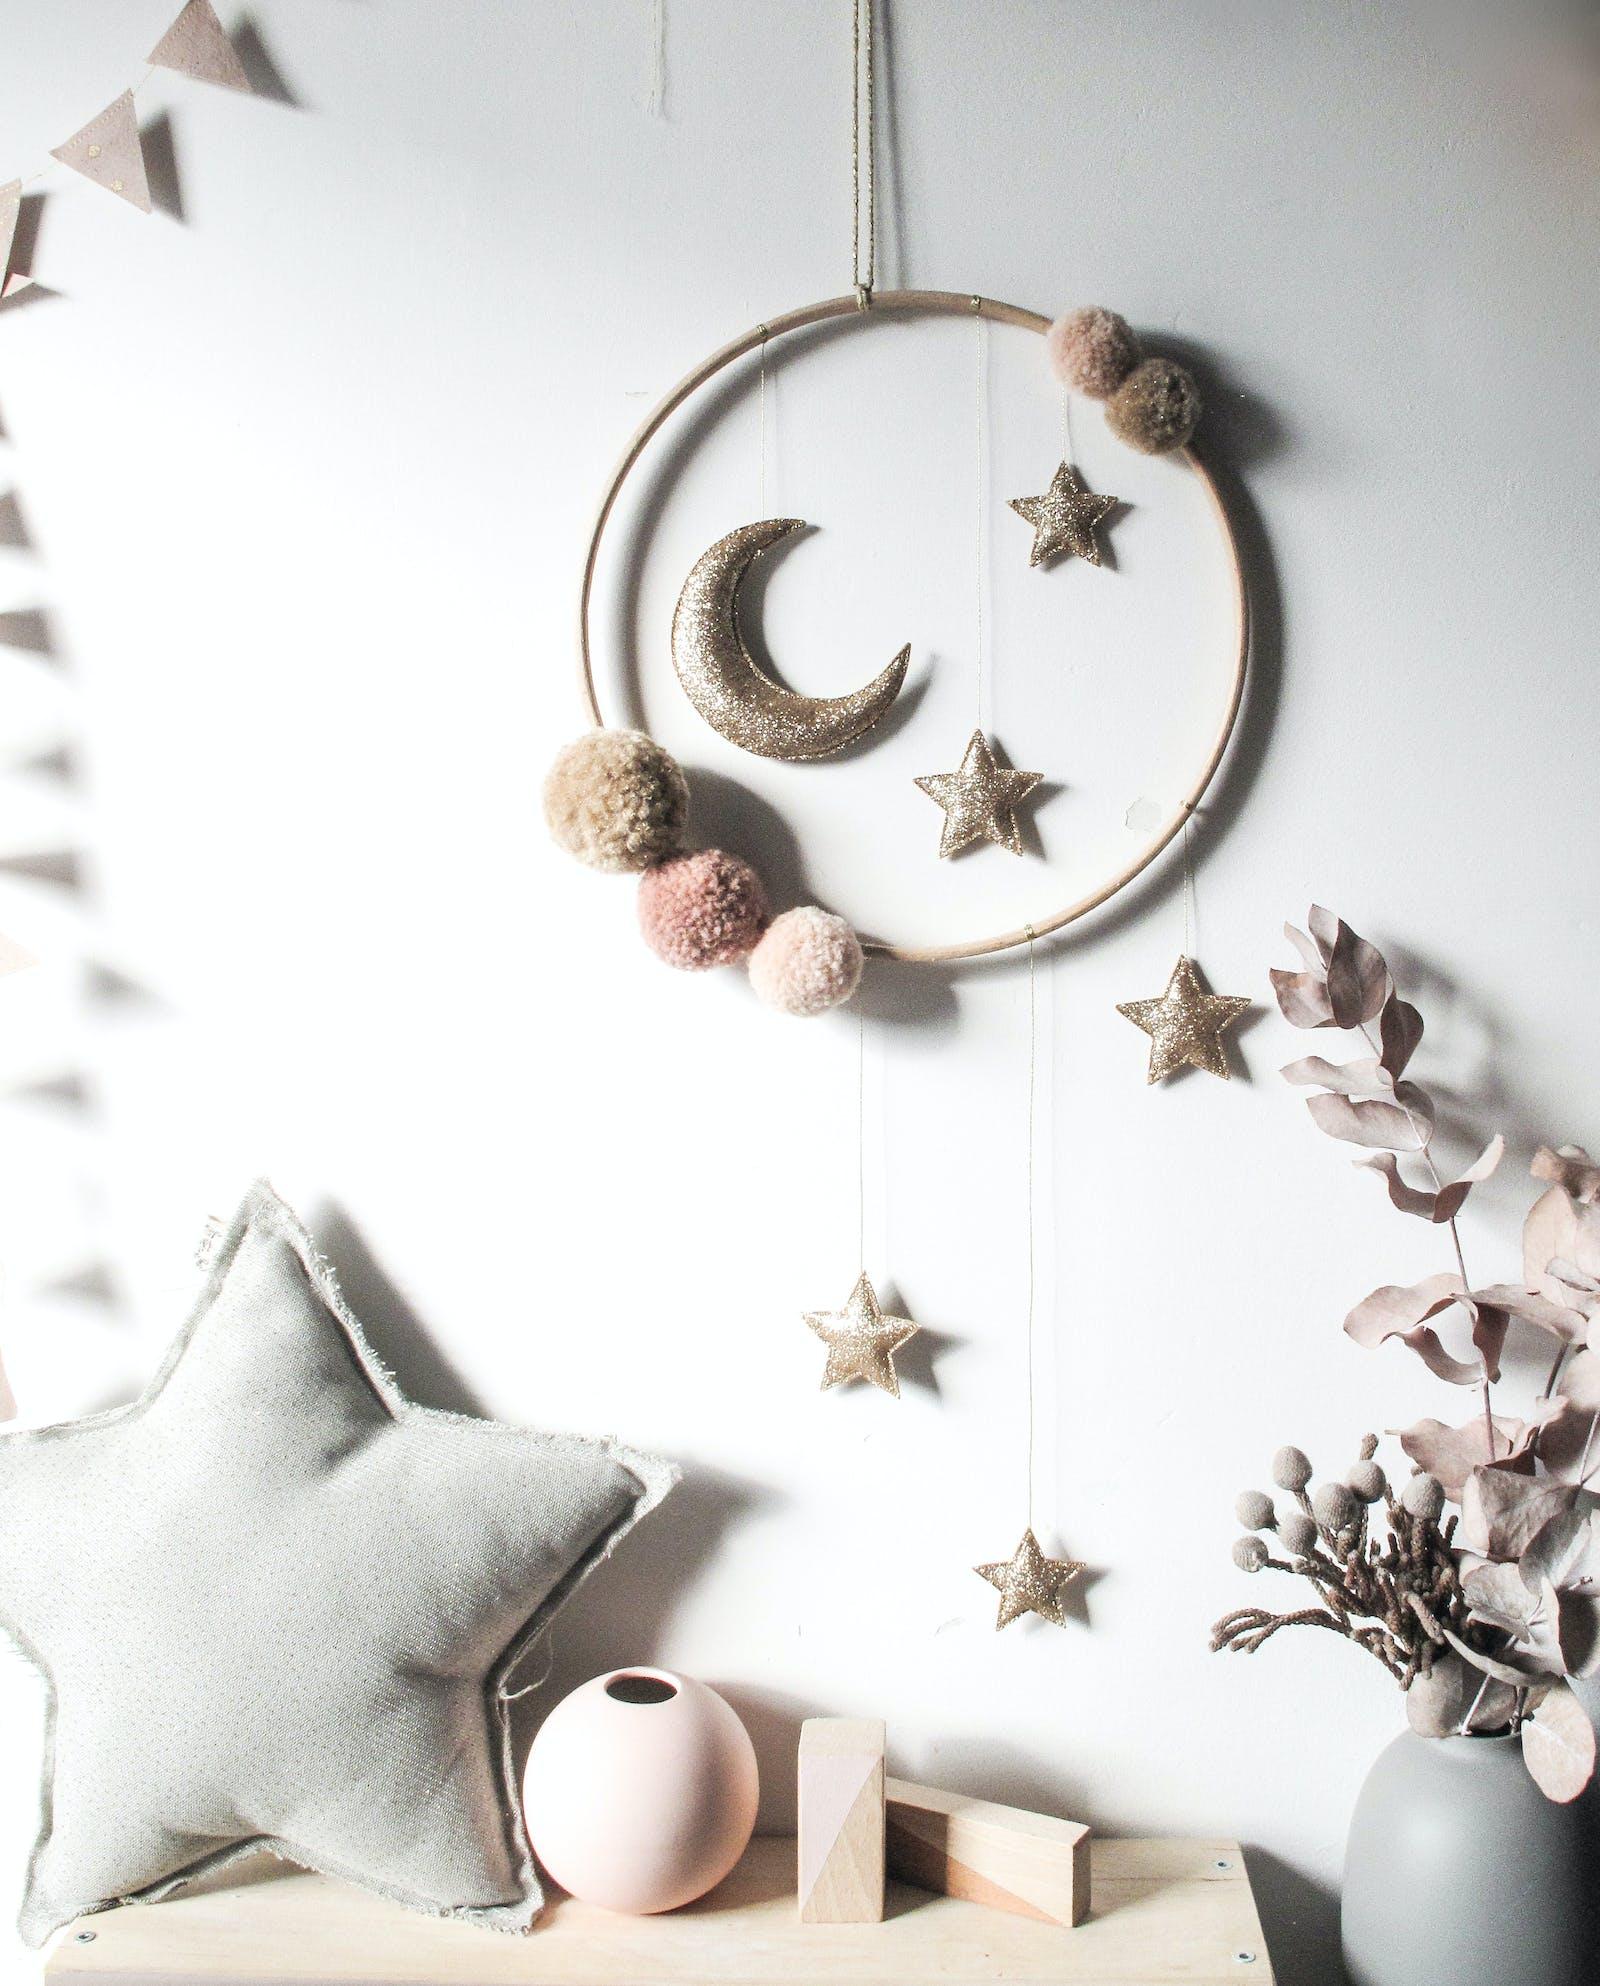 Homemade starry night decor